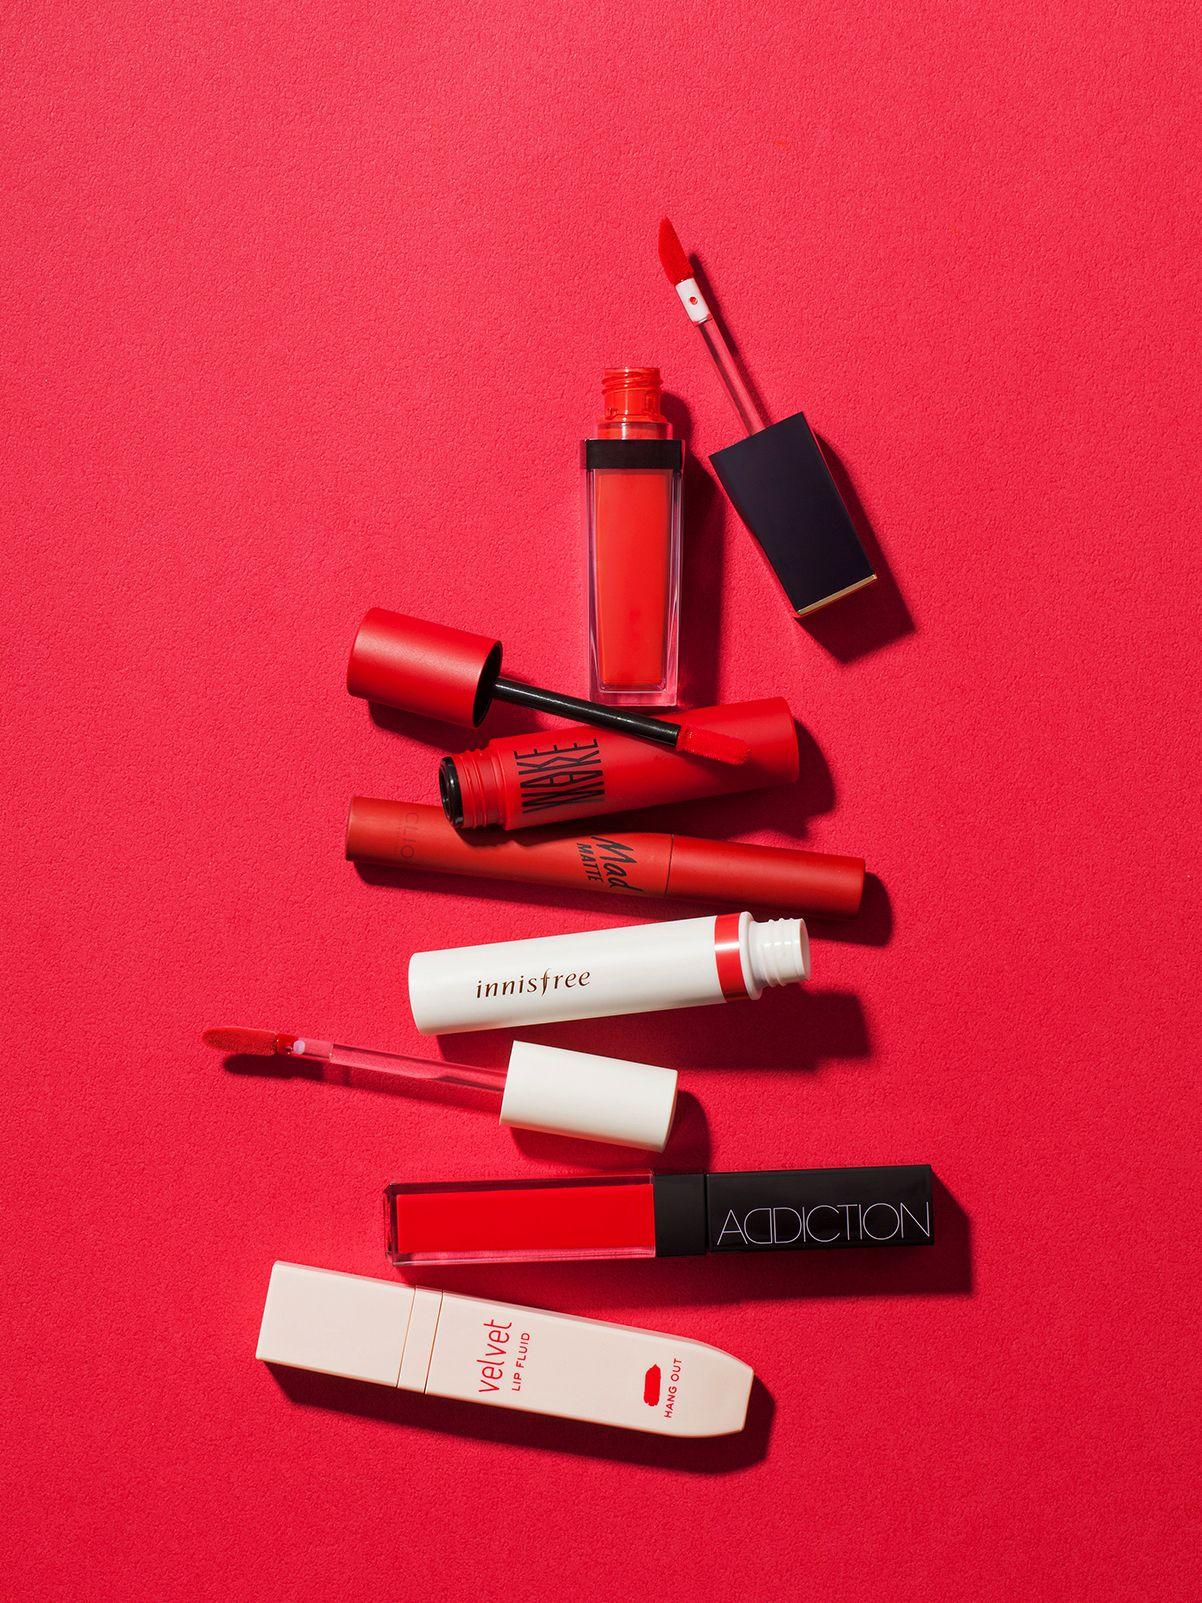 Pin By Hye Jeong Choi On Portfolio Beauty Still Life Body Care Cosmetics Beauty